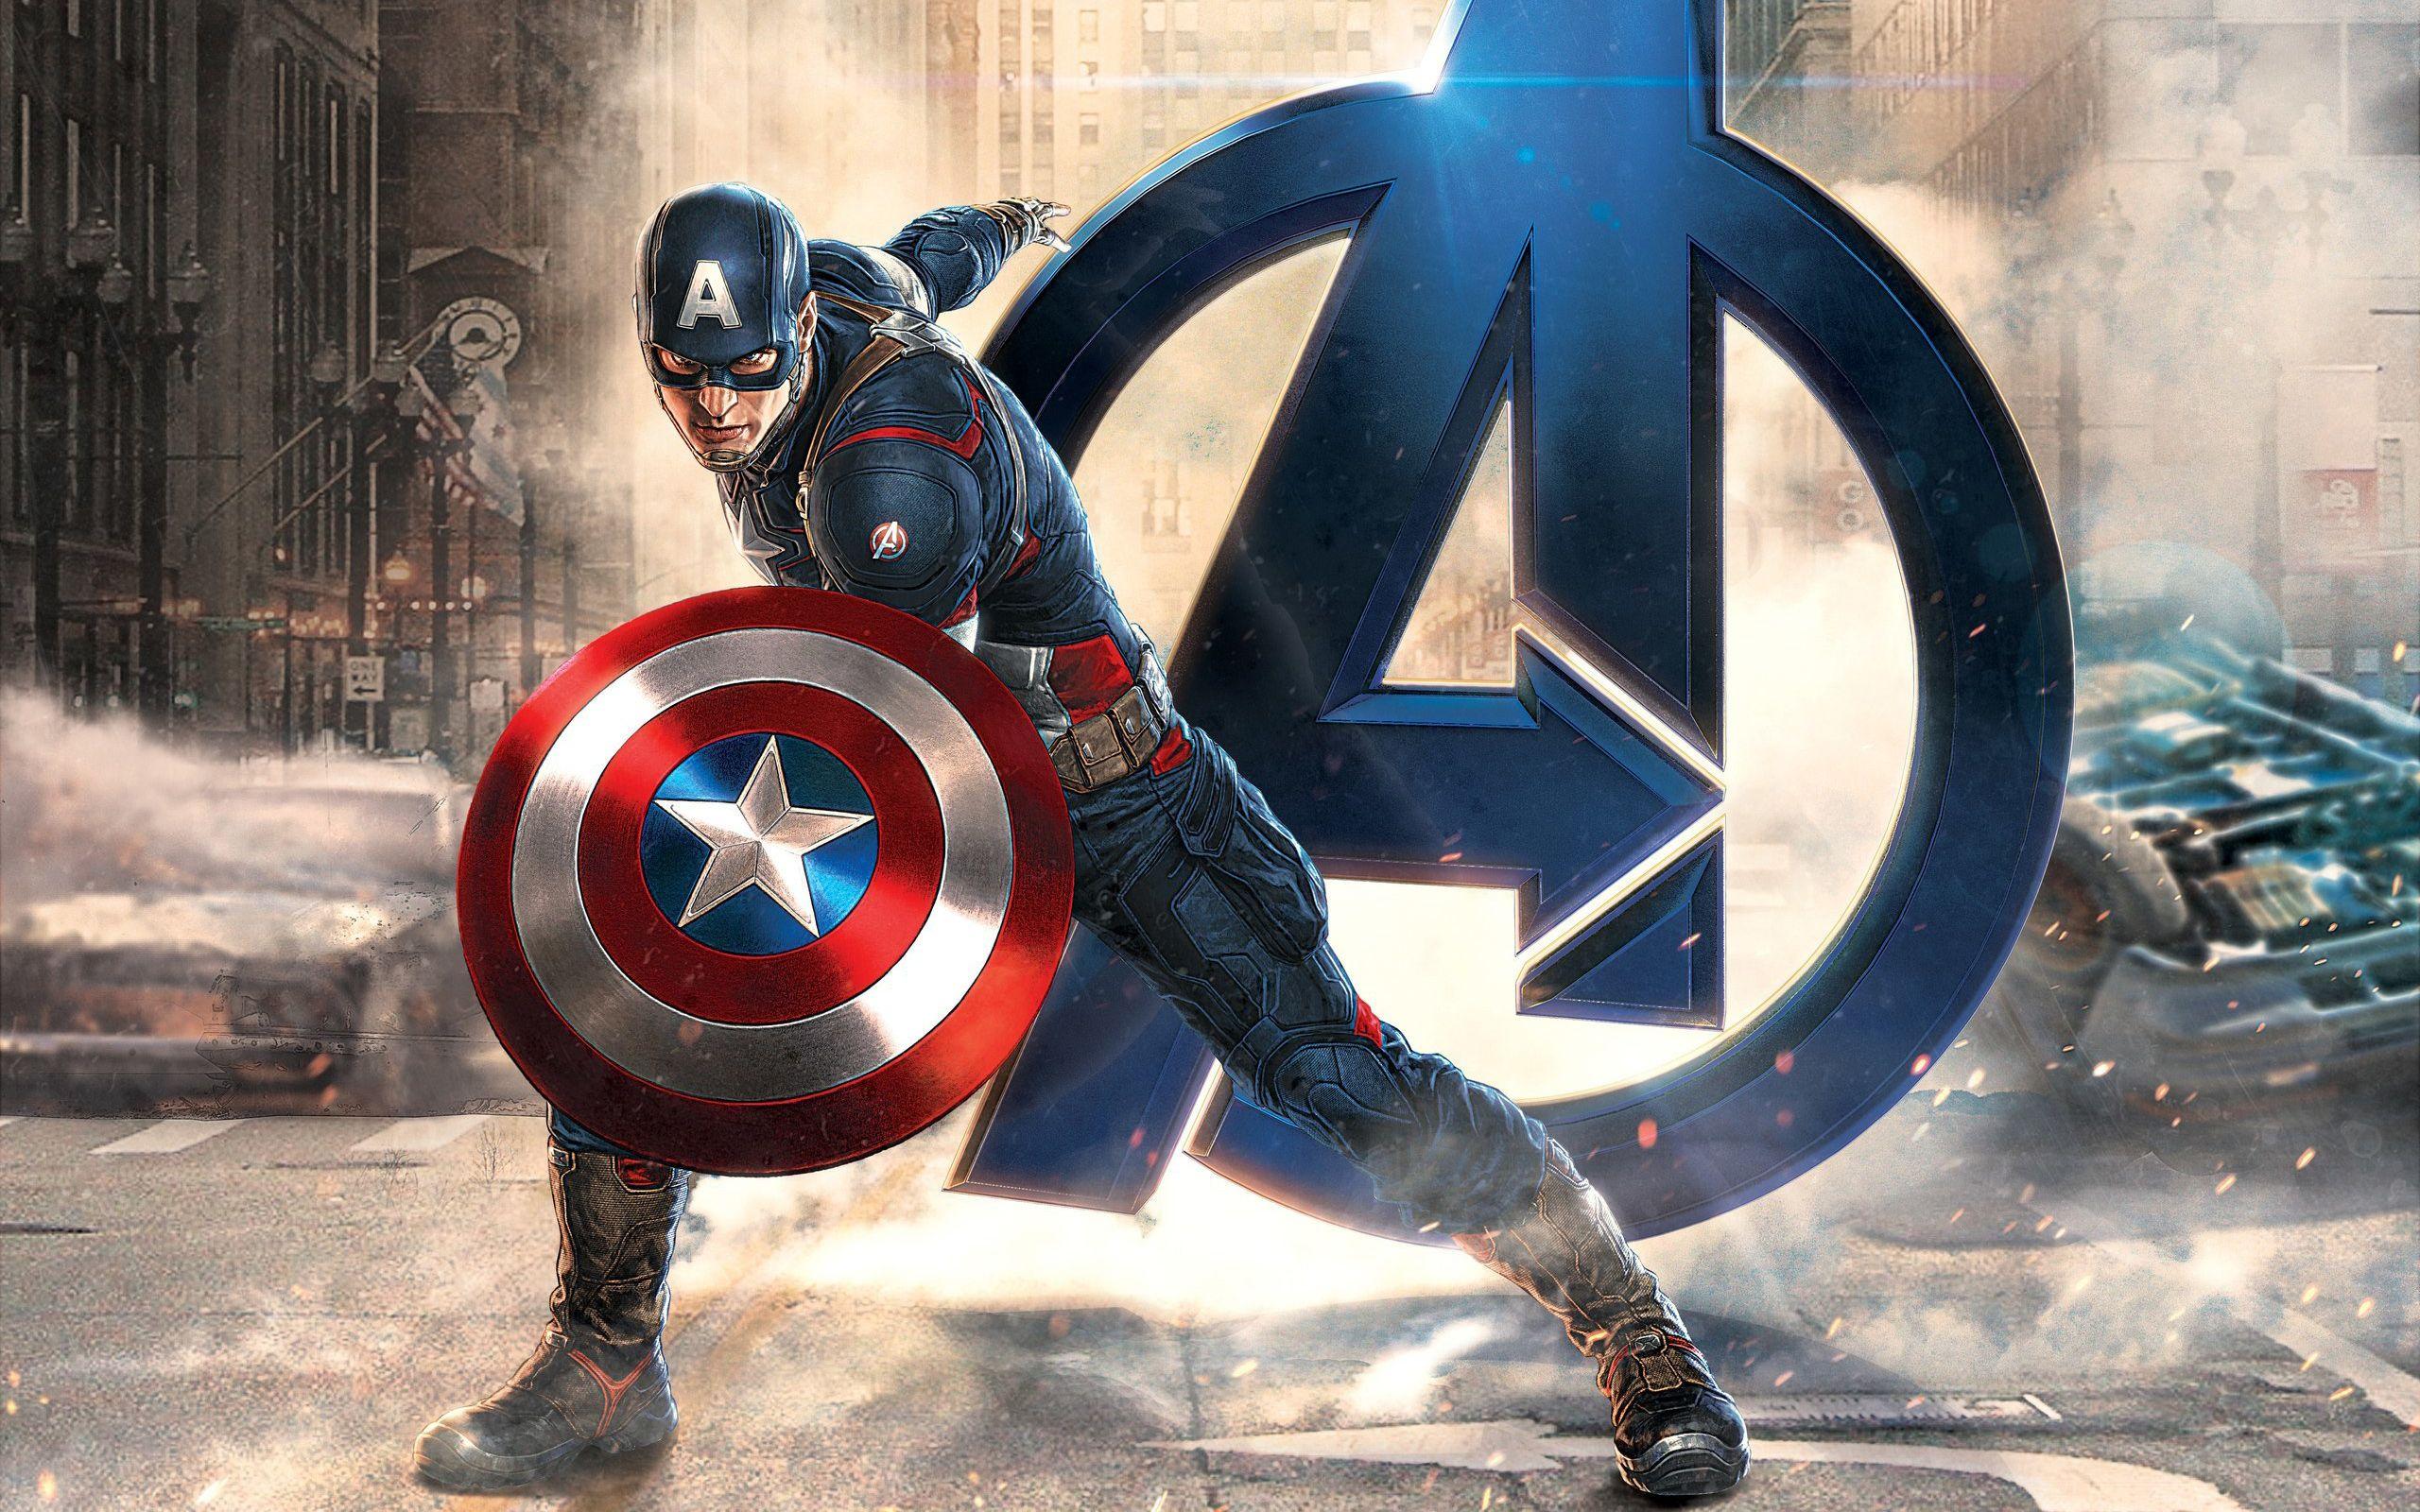 Captain America Wallpaper HD Resolution ld x px . MB